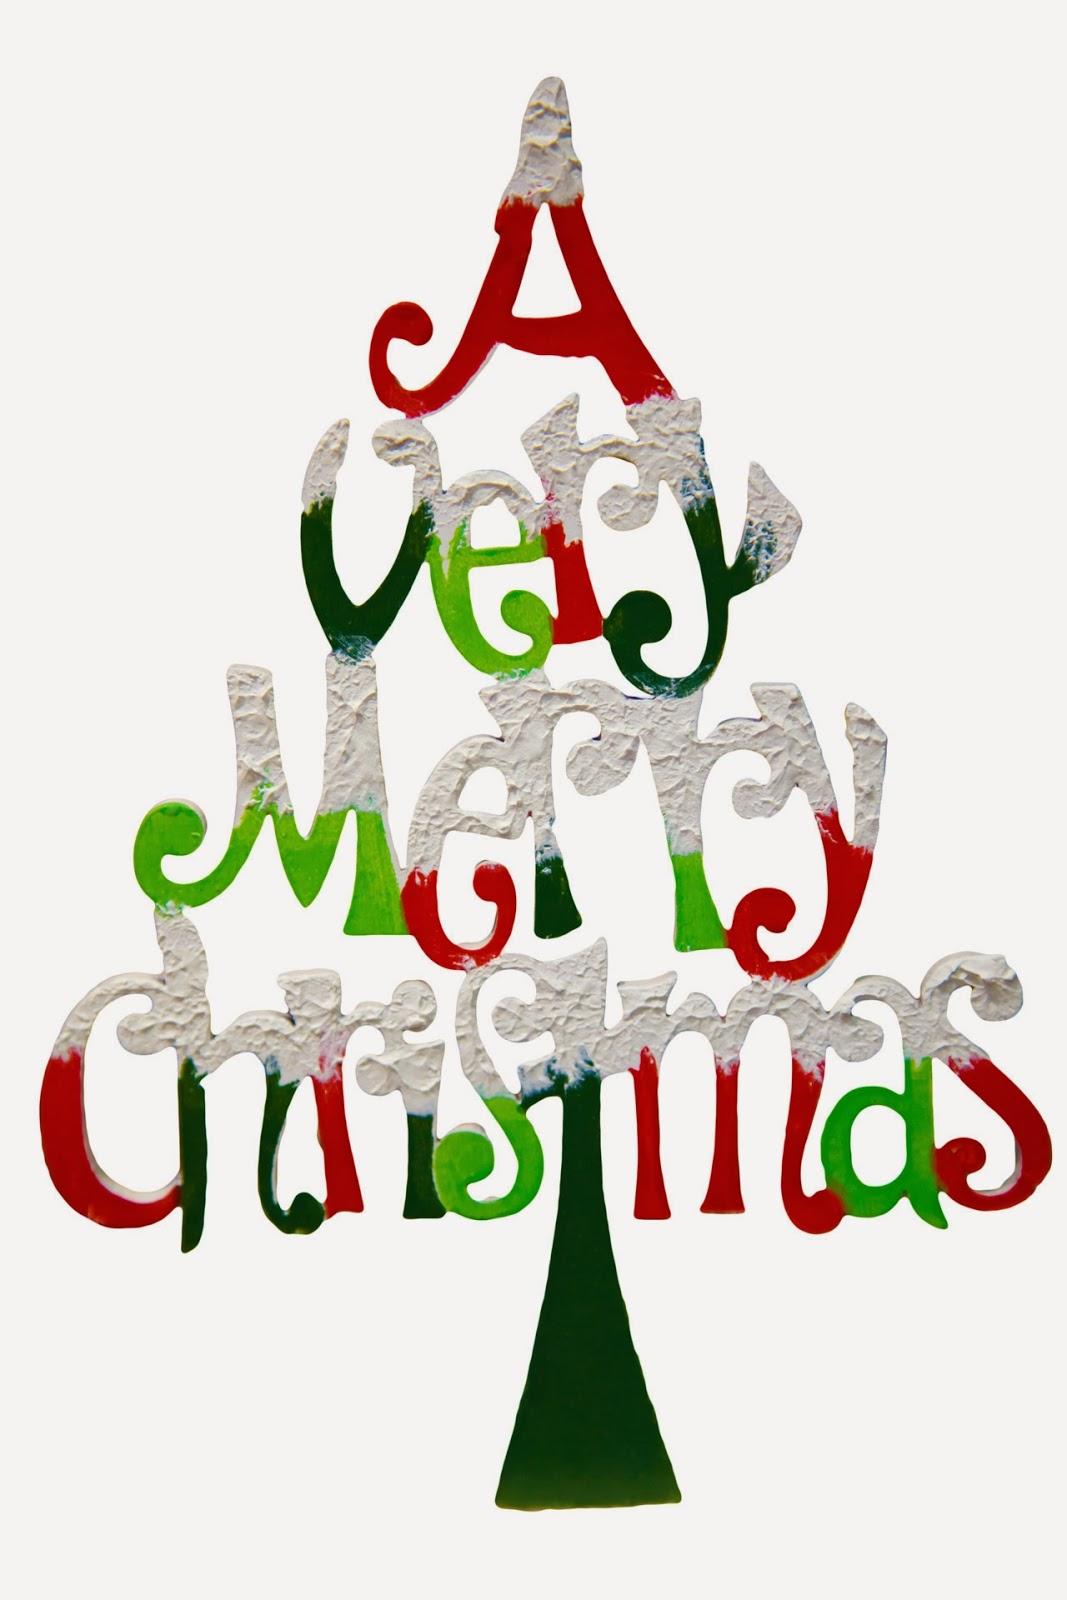 Religious Merry Christmas Clipart   Clip-Religious Merry Christmas Clipart   Clipart library - Free Clipart. merry christmas (1).jpg-15